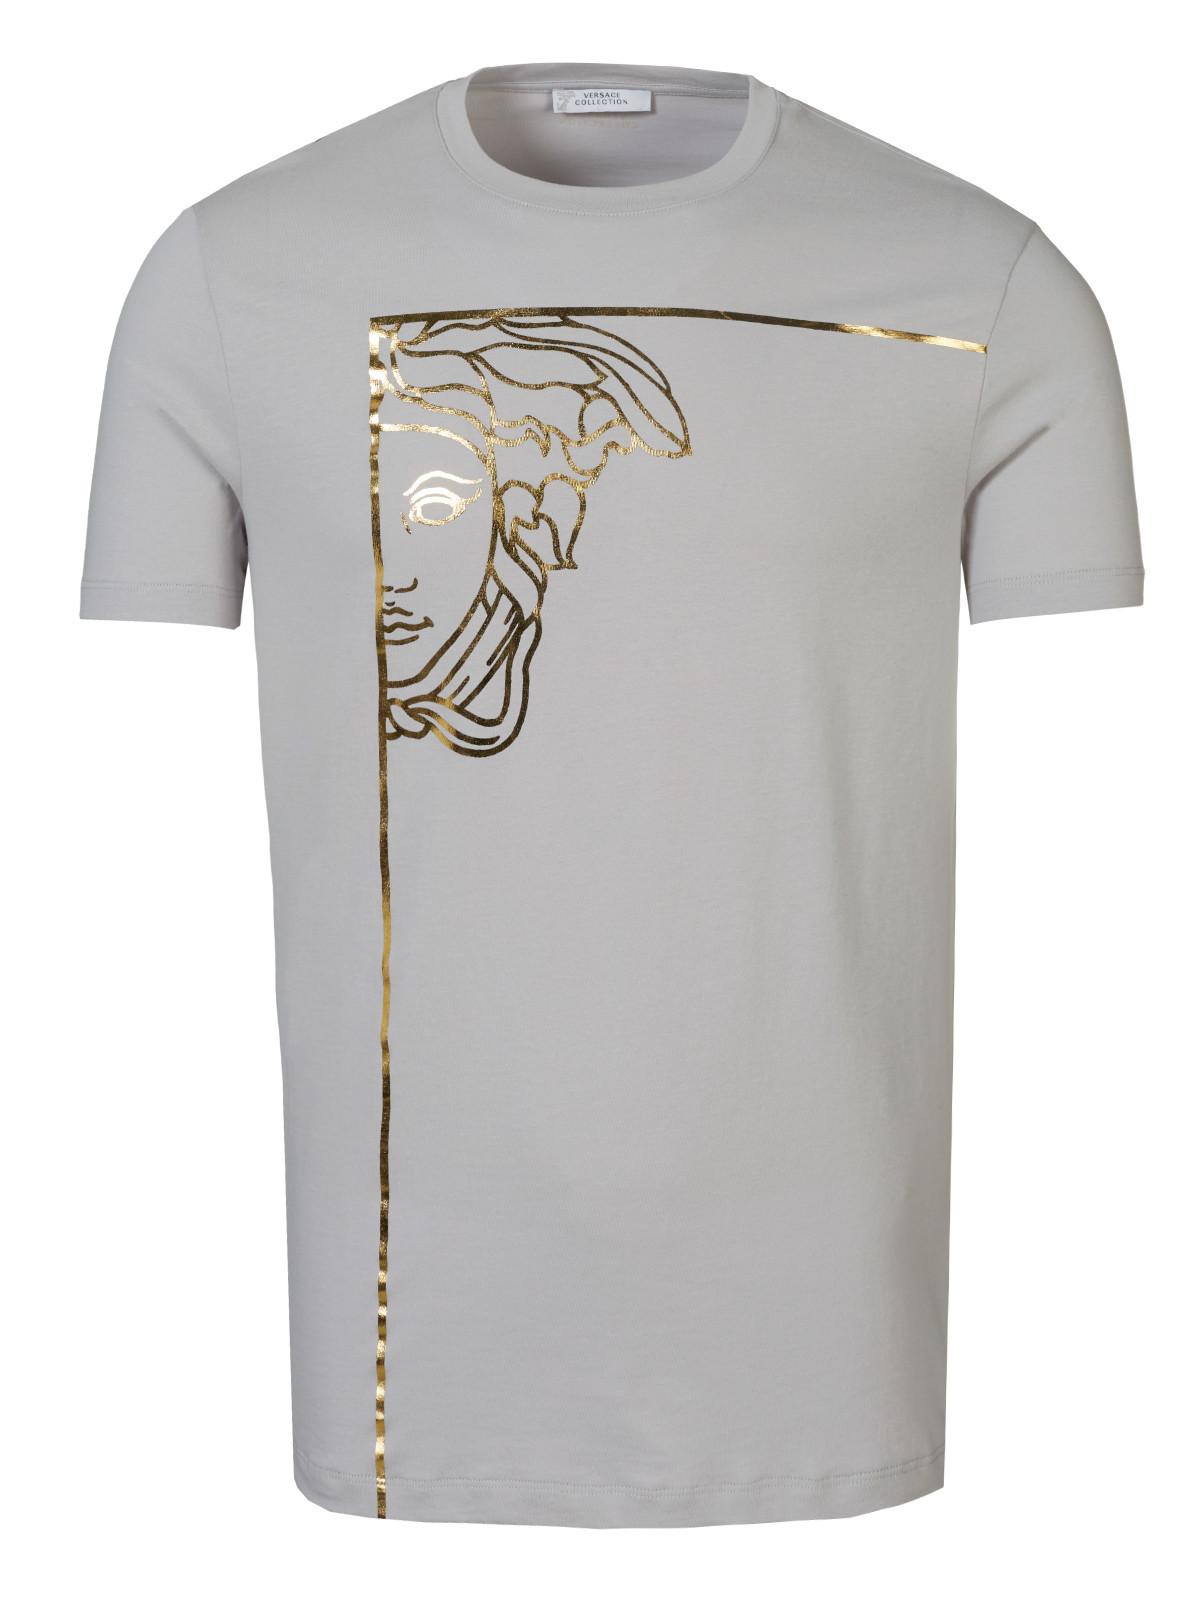 3fd7e69a Versace Collection T-shirt grey | Fashionesta online shop